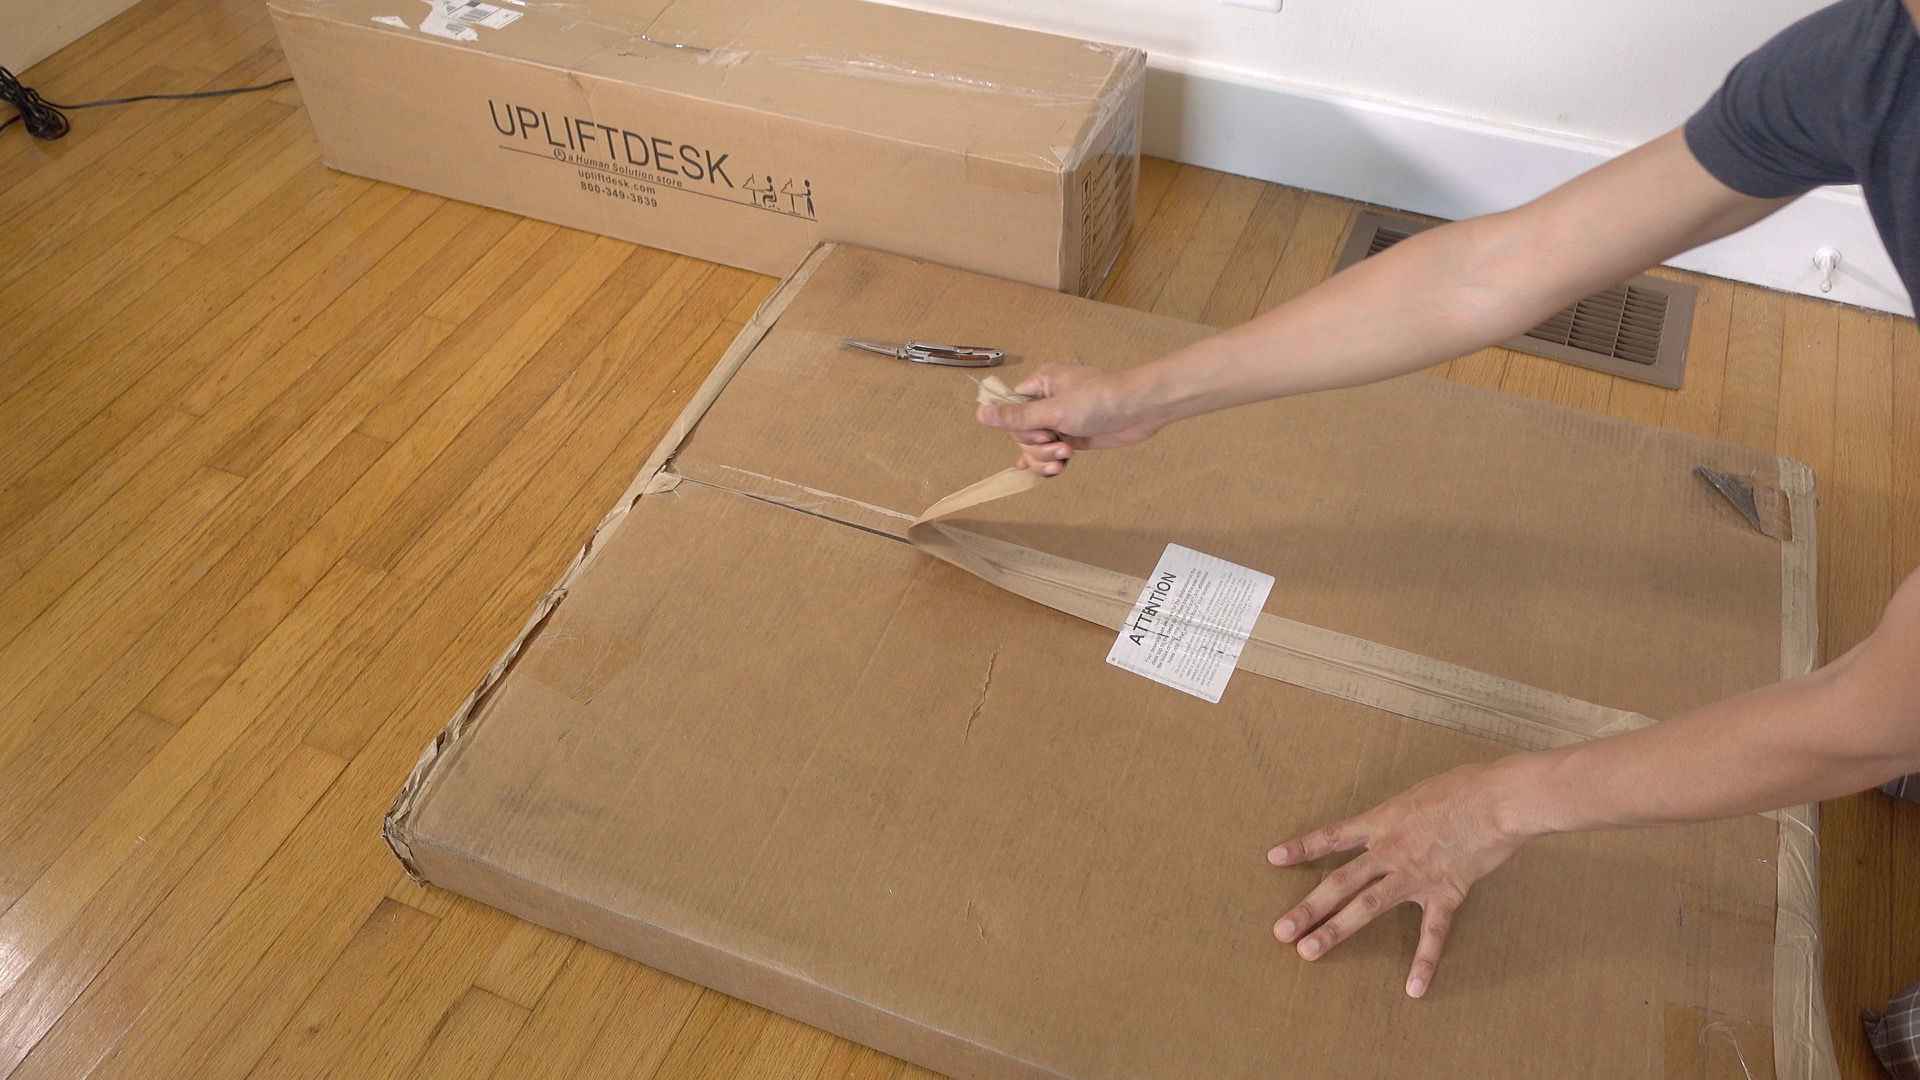 Uplift Desk Unboxing